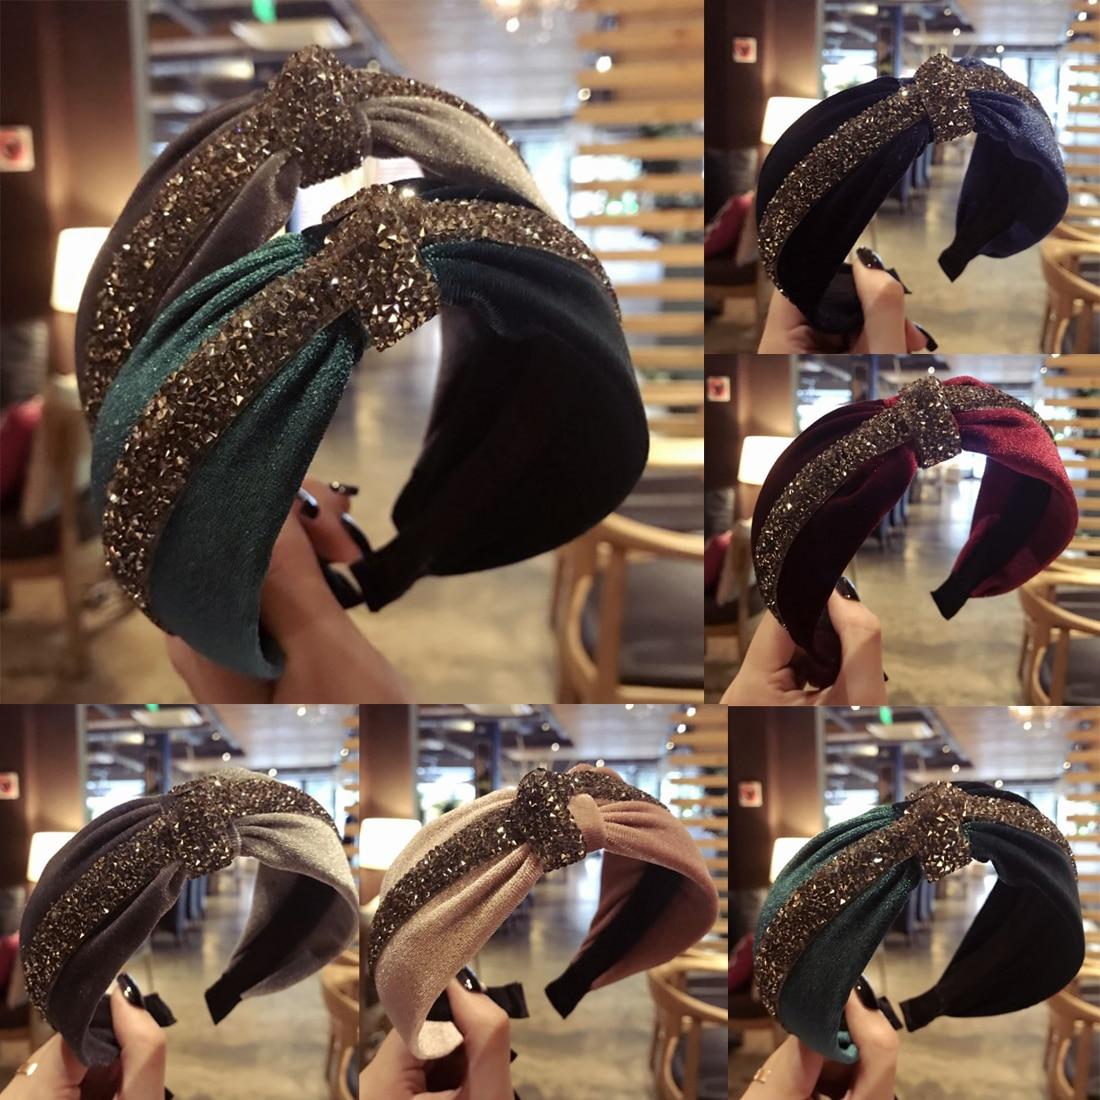 2019 Velvet Hairband For Women Girls Hair Accessories Bezel Headband Big Bow Hair Hoop Winter   Headwear   Party Christmas Gifts